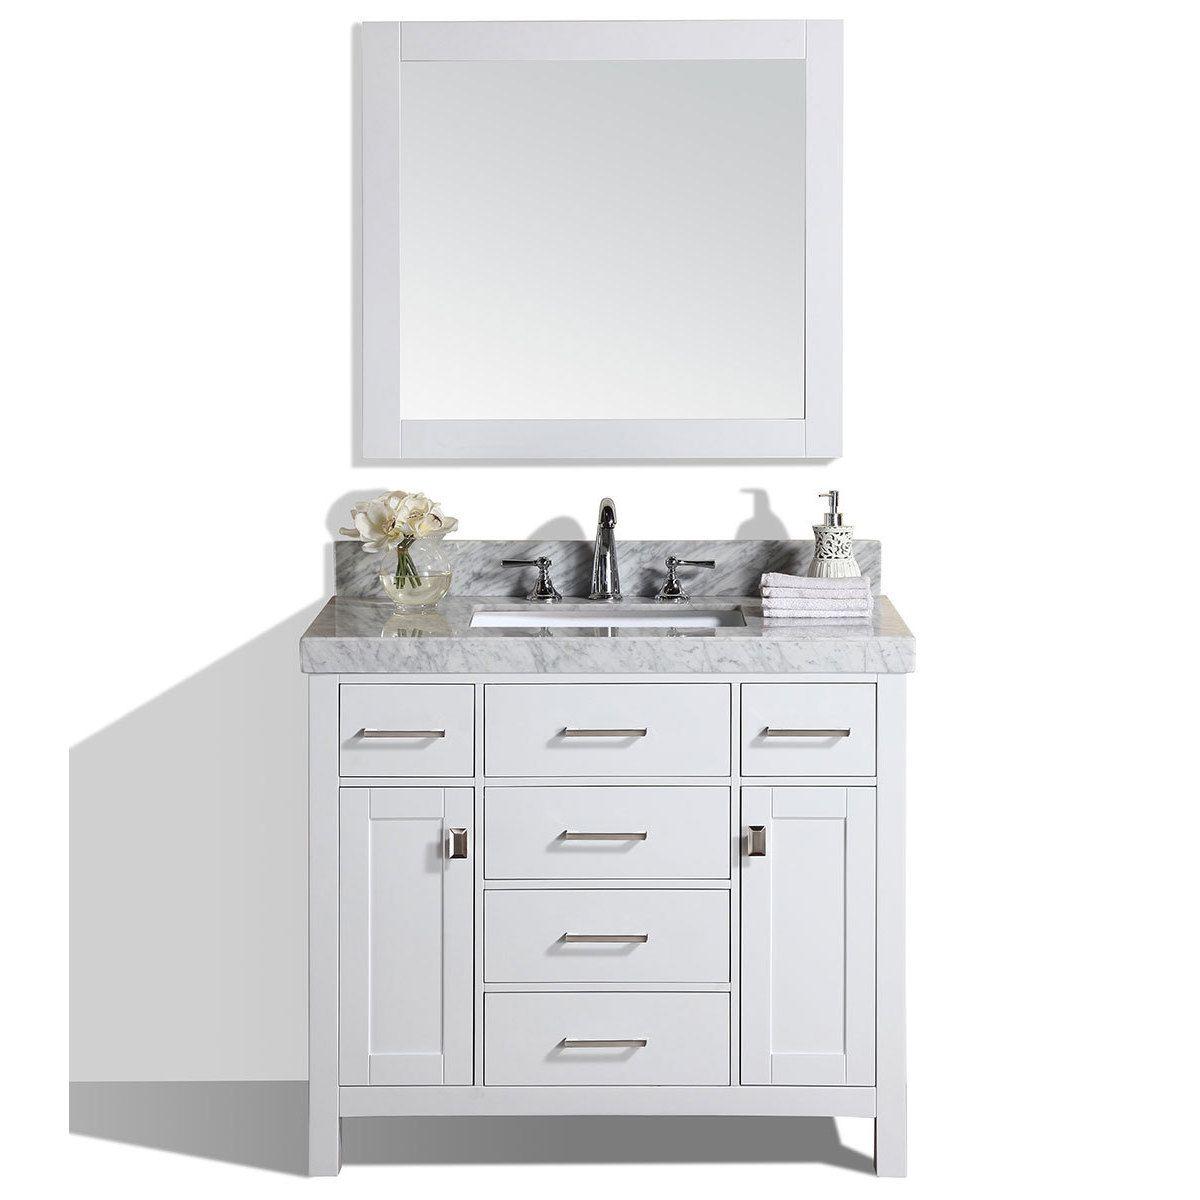 Pacific Collection 40Inch Malibu White Single Modern Bathroom Entrancing 40 Inch Bathroom Vanity Decorating Inspiration